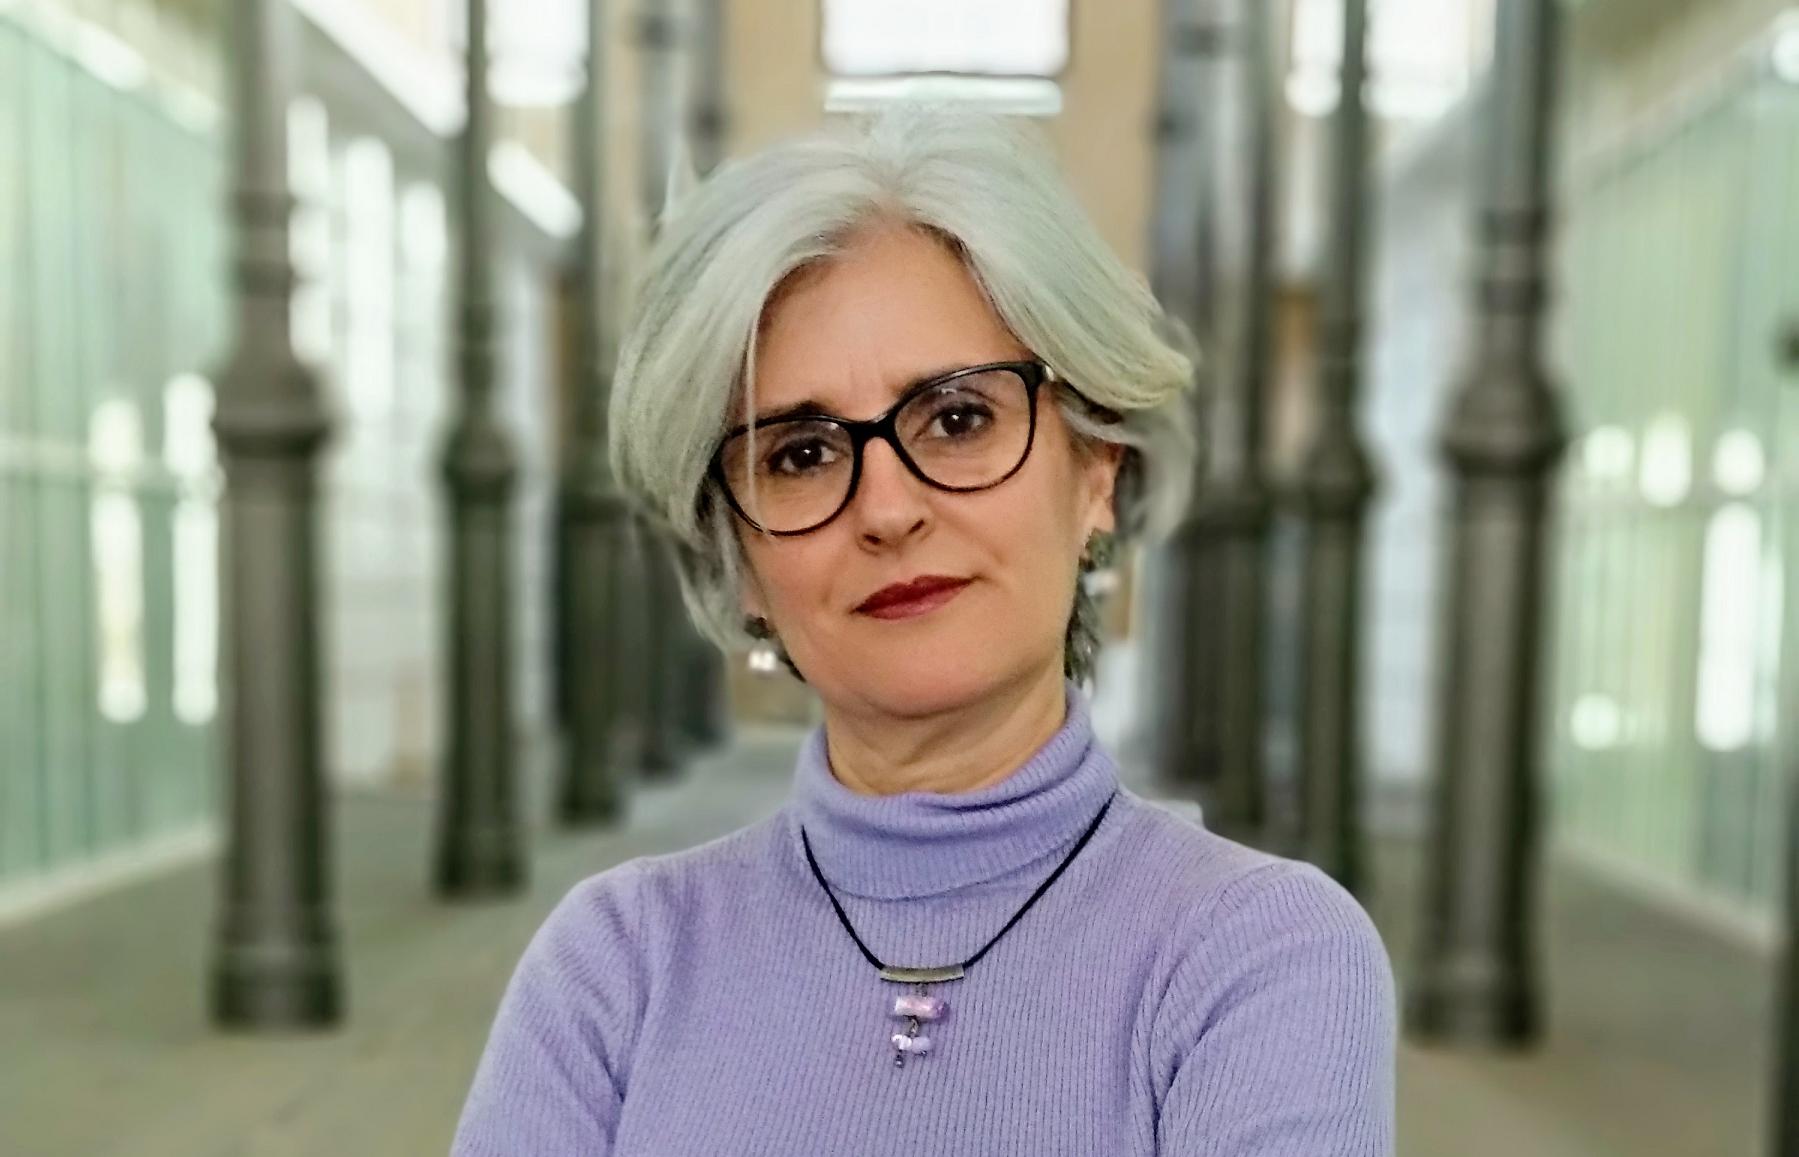 Susana Martín: